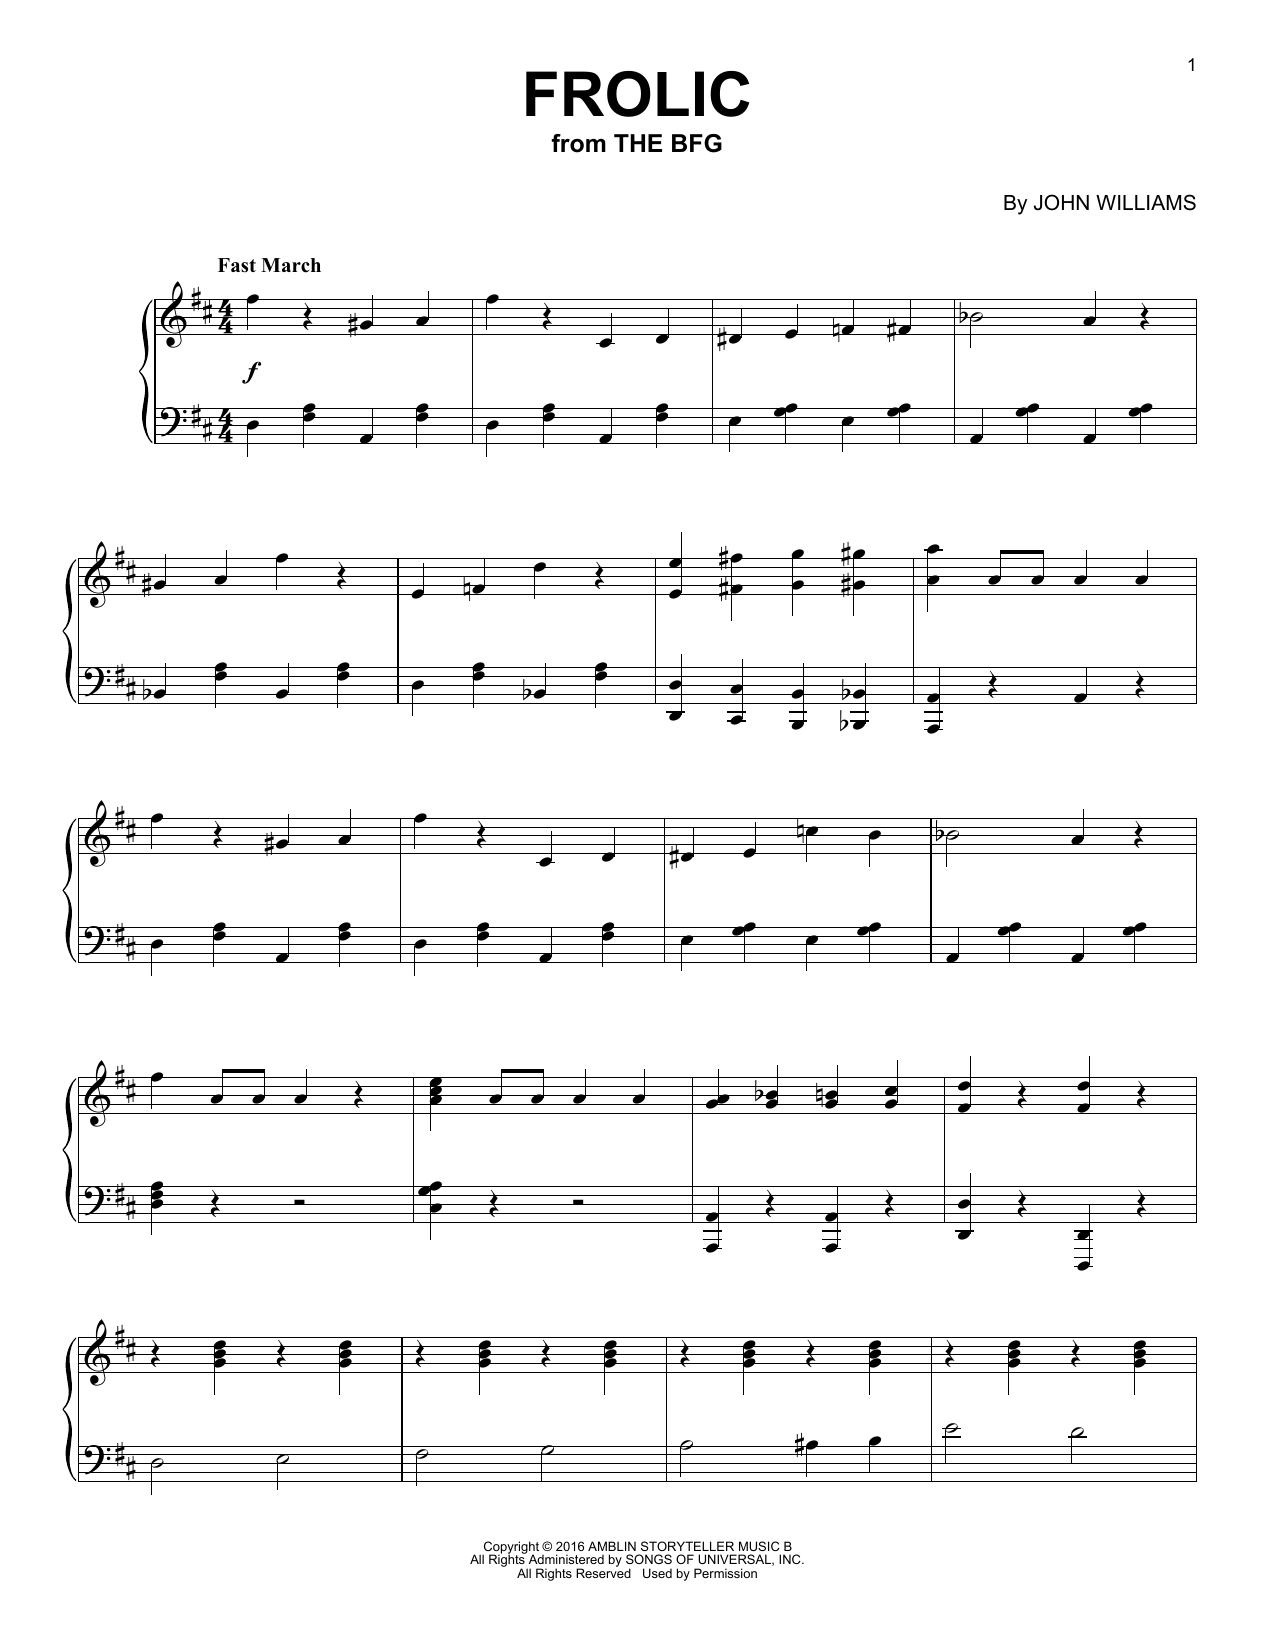 John Williams Frolic sheet music notes and chords. Download Printable PDF.